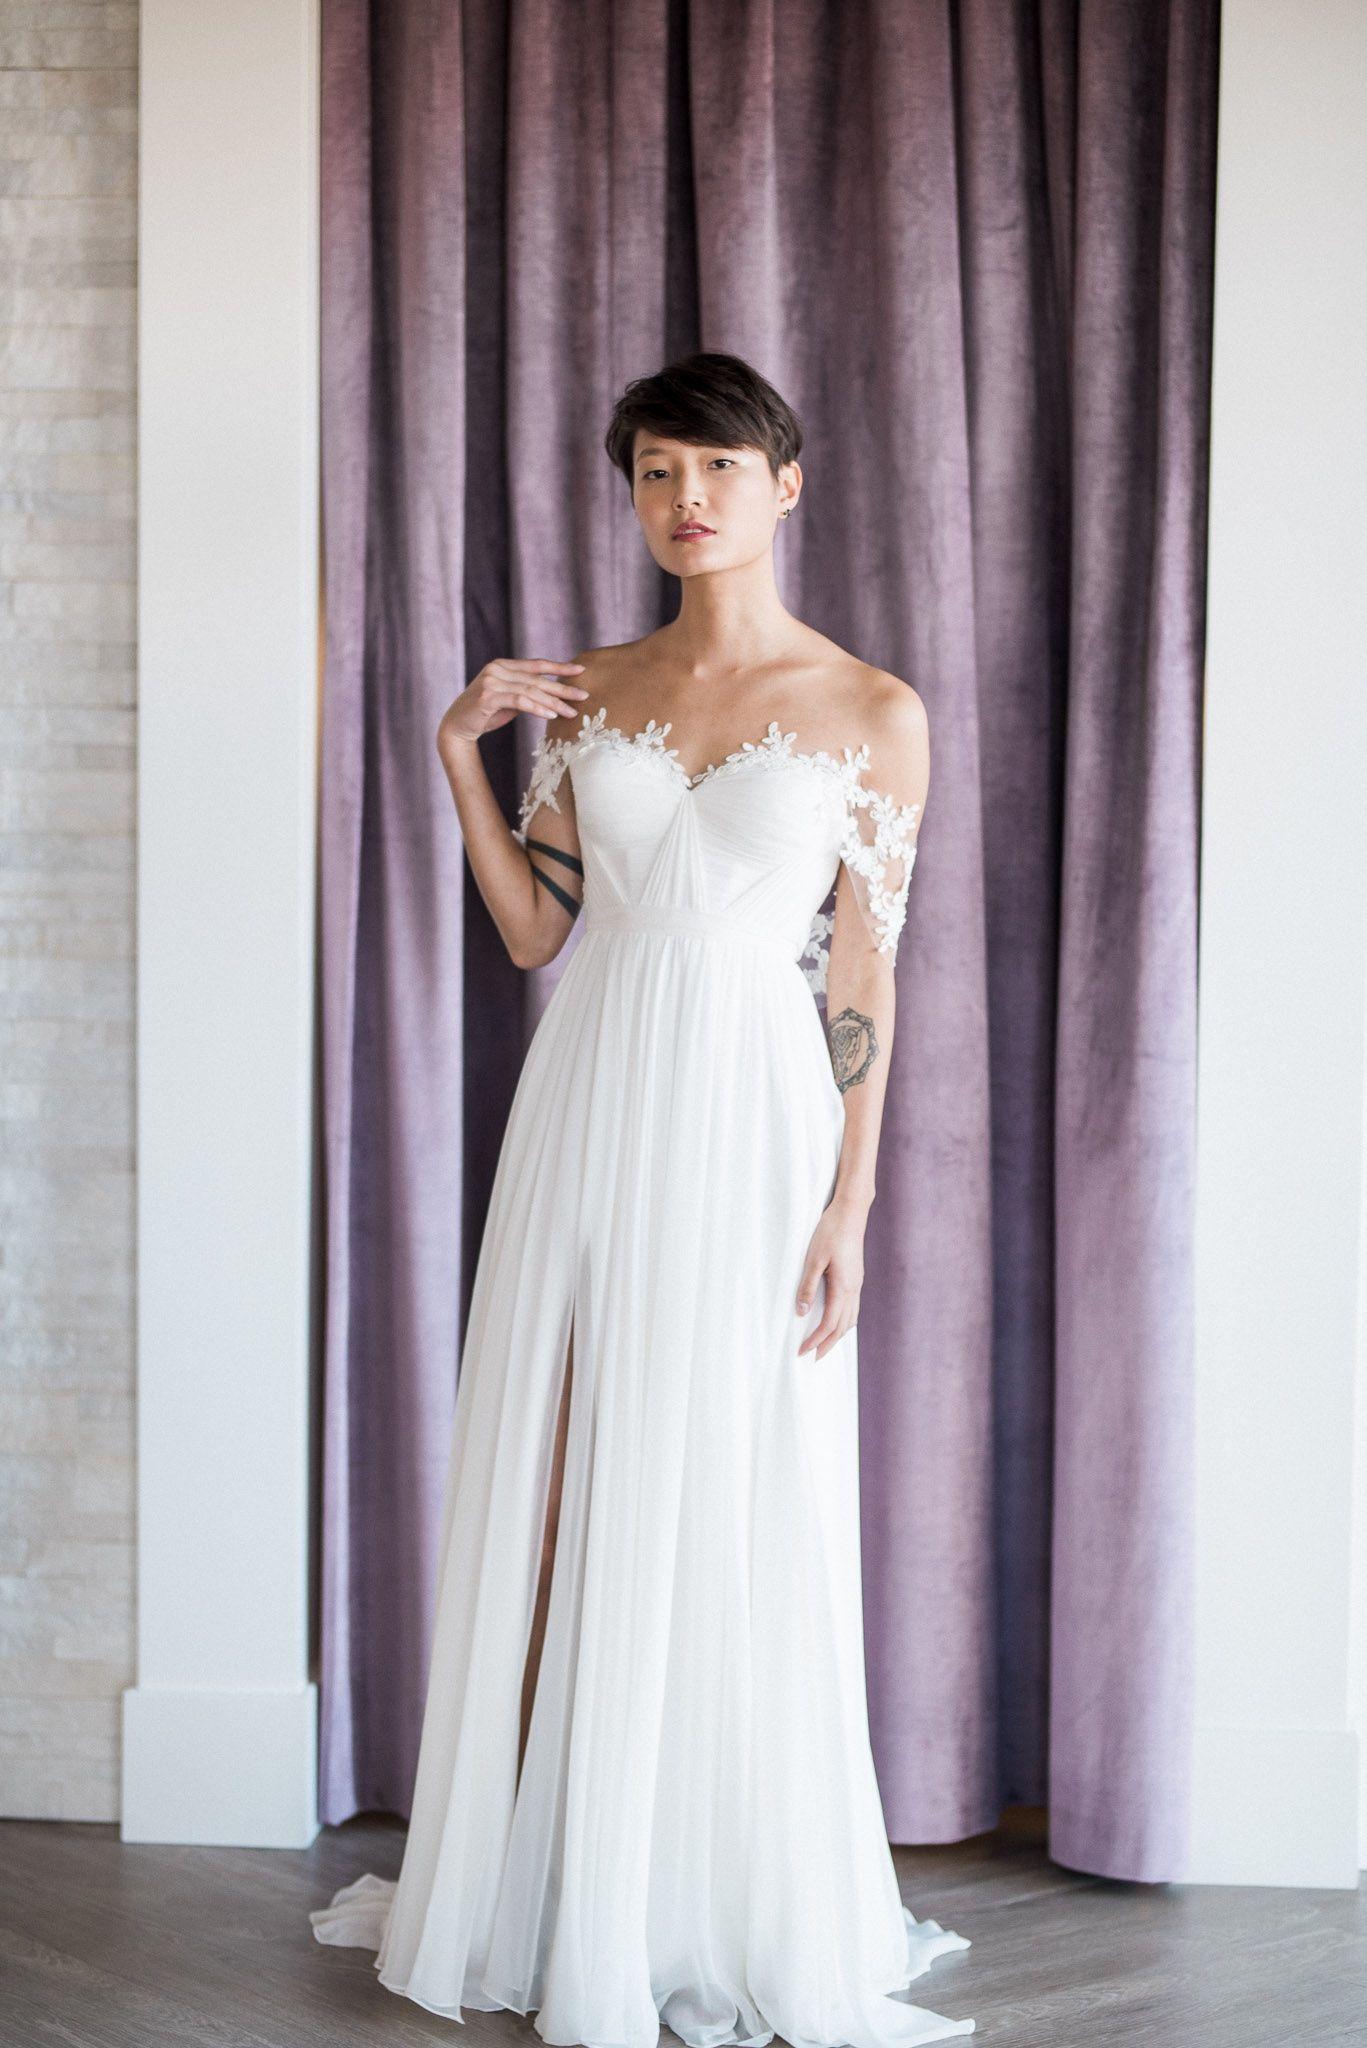 Grey Pearl Bridal Wedding Gown Las Vegas Wedding Dresses Wedding Dress Boutiques Vegas Wedding Dress